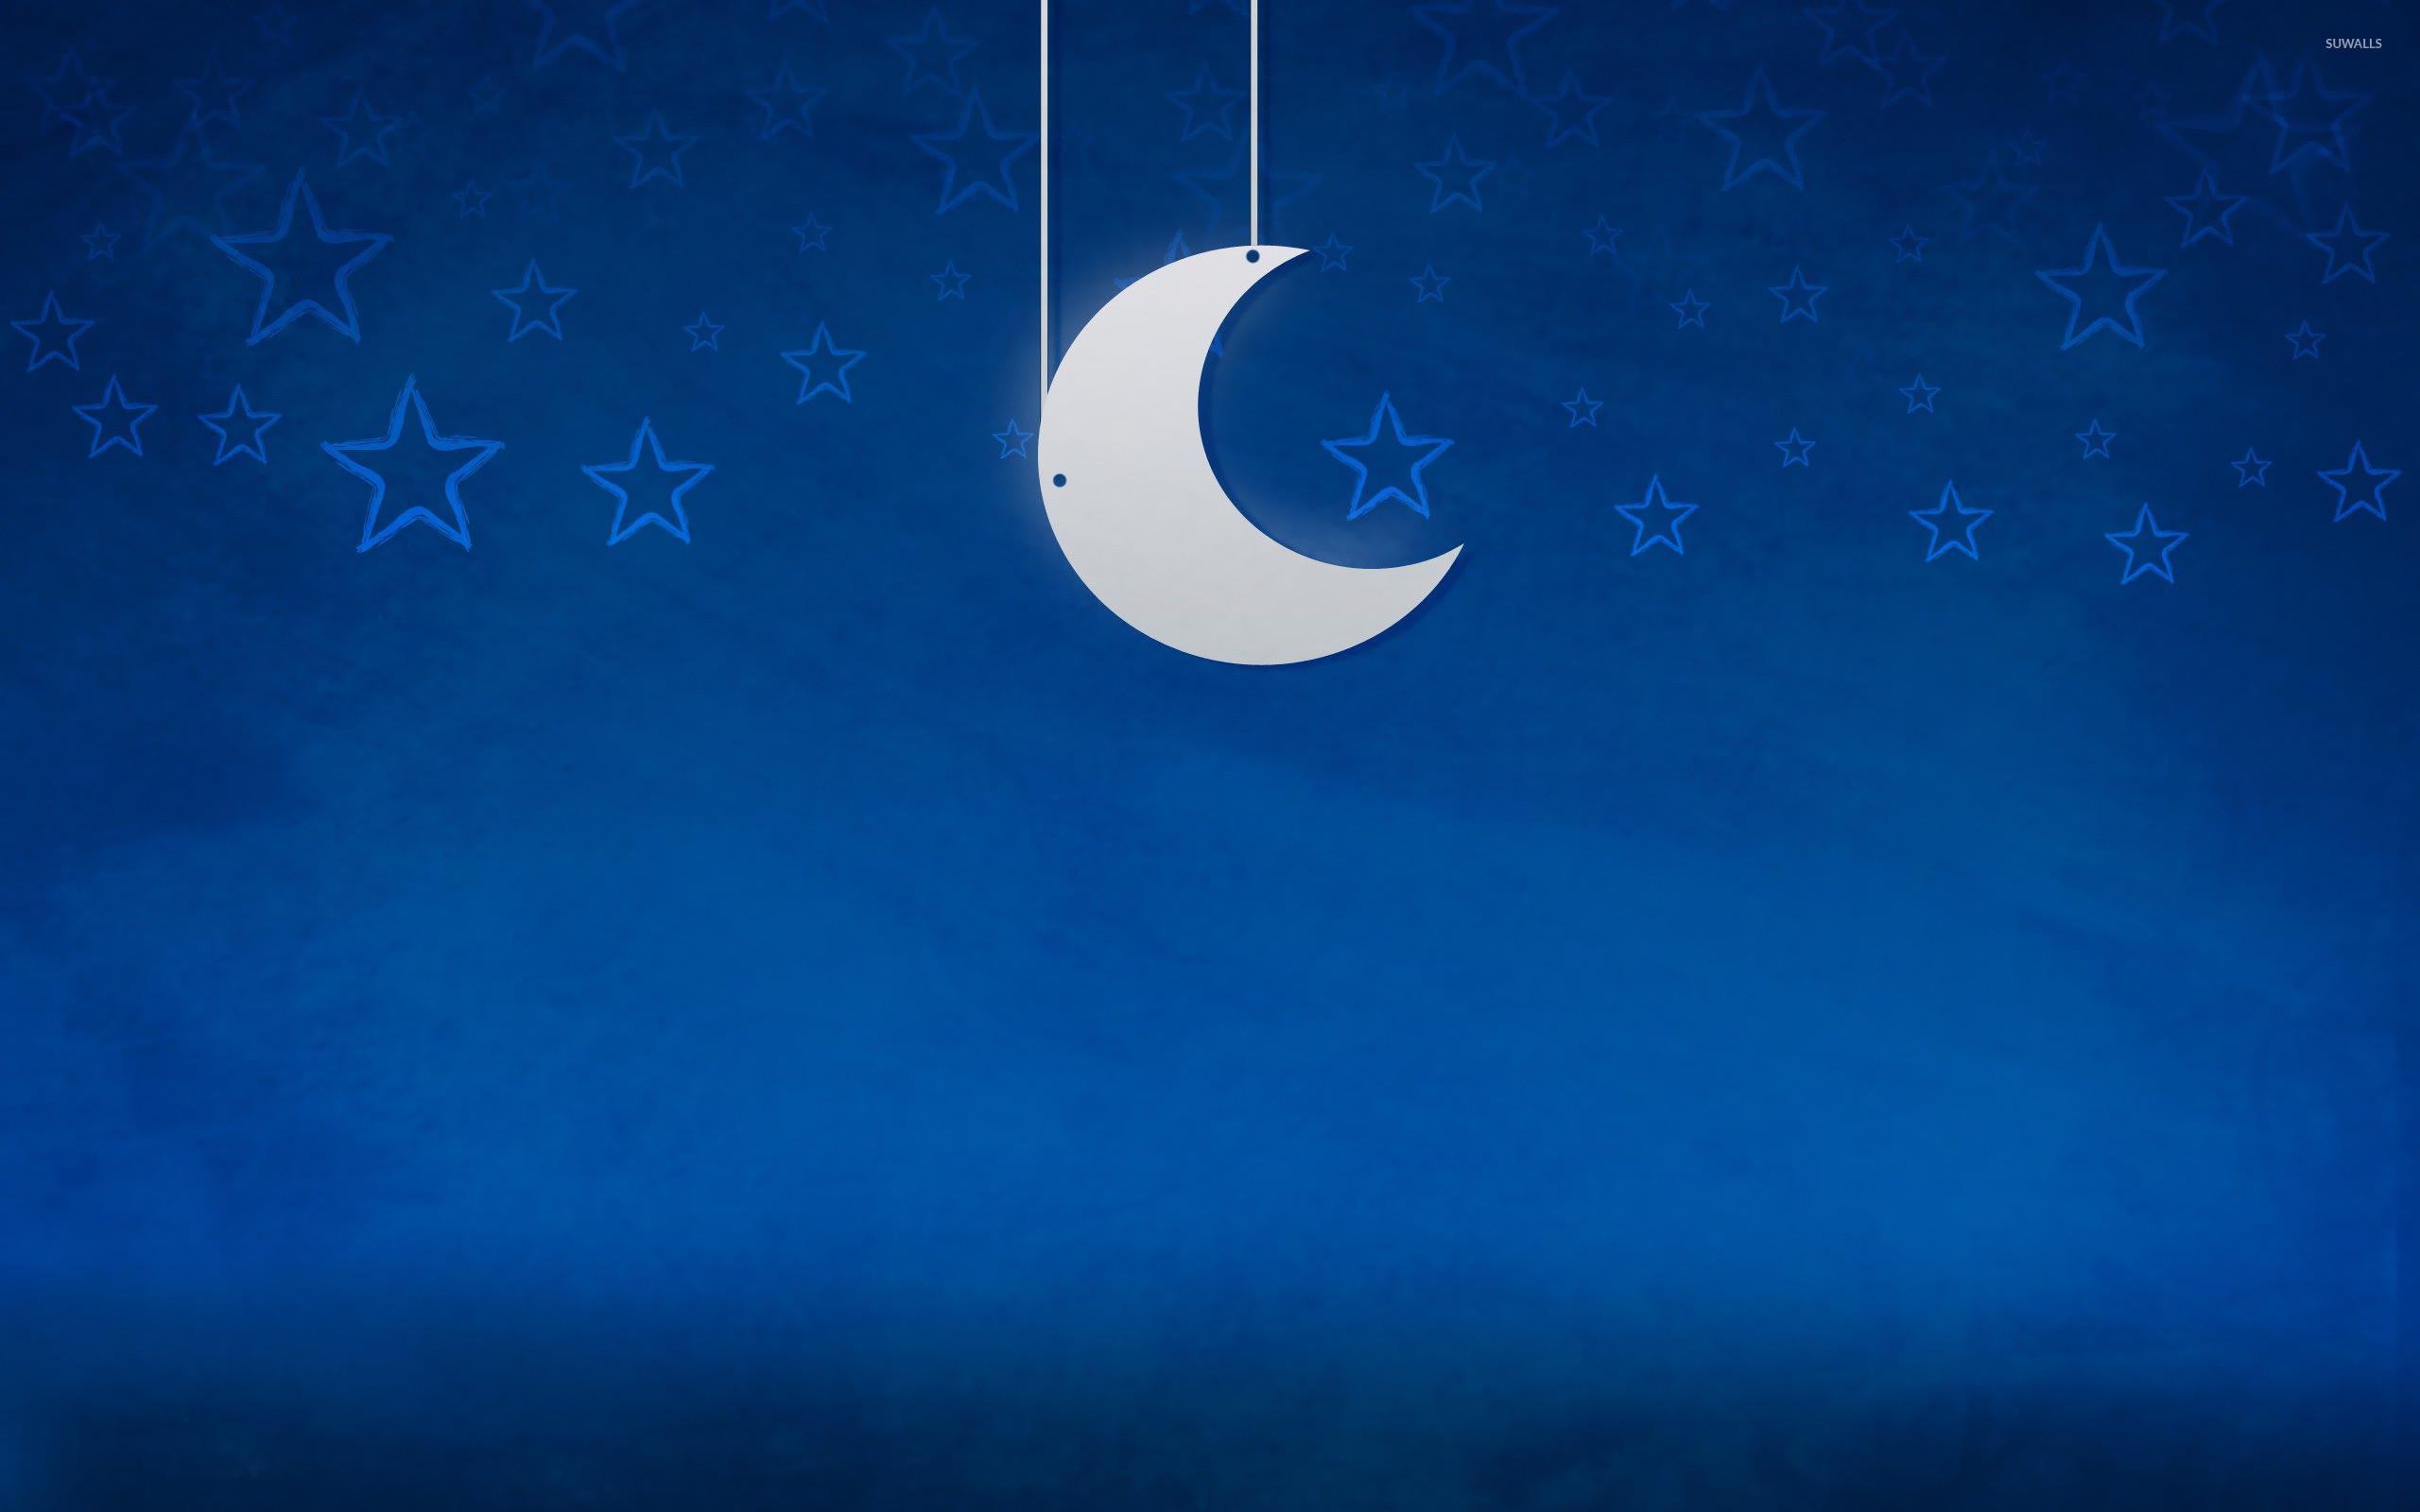 Moon and stars wallpaper – Vector wallpapers – #22060